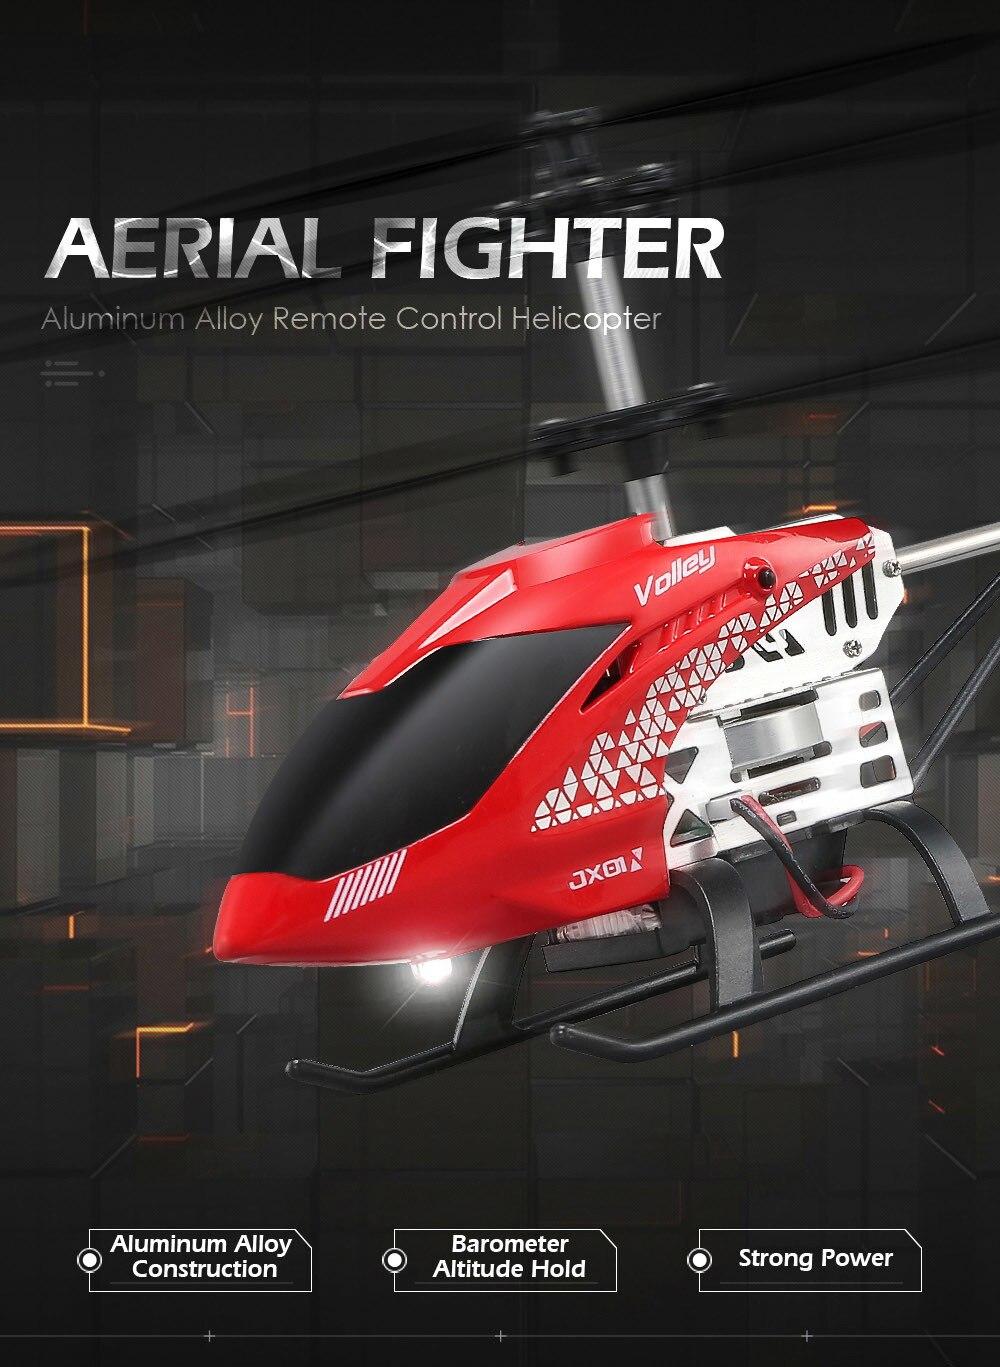 JJRC سبائك هليكوبتر مقياسا 1